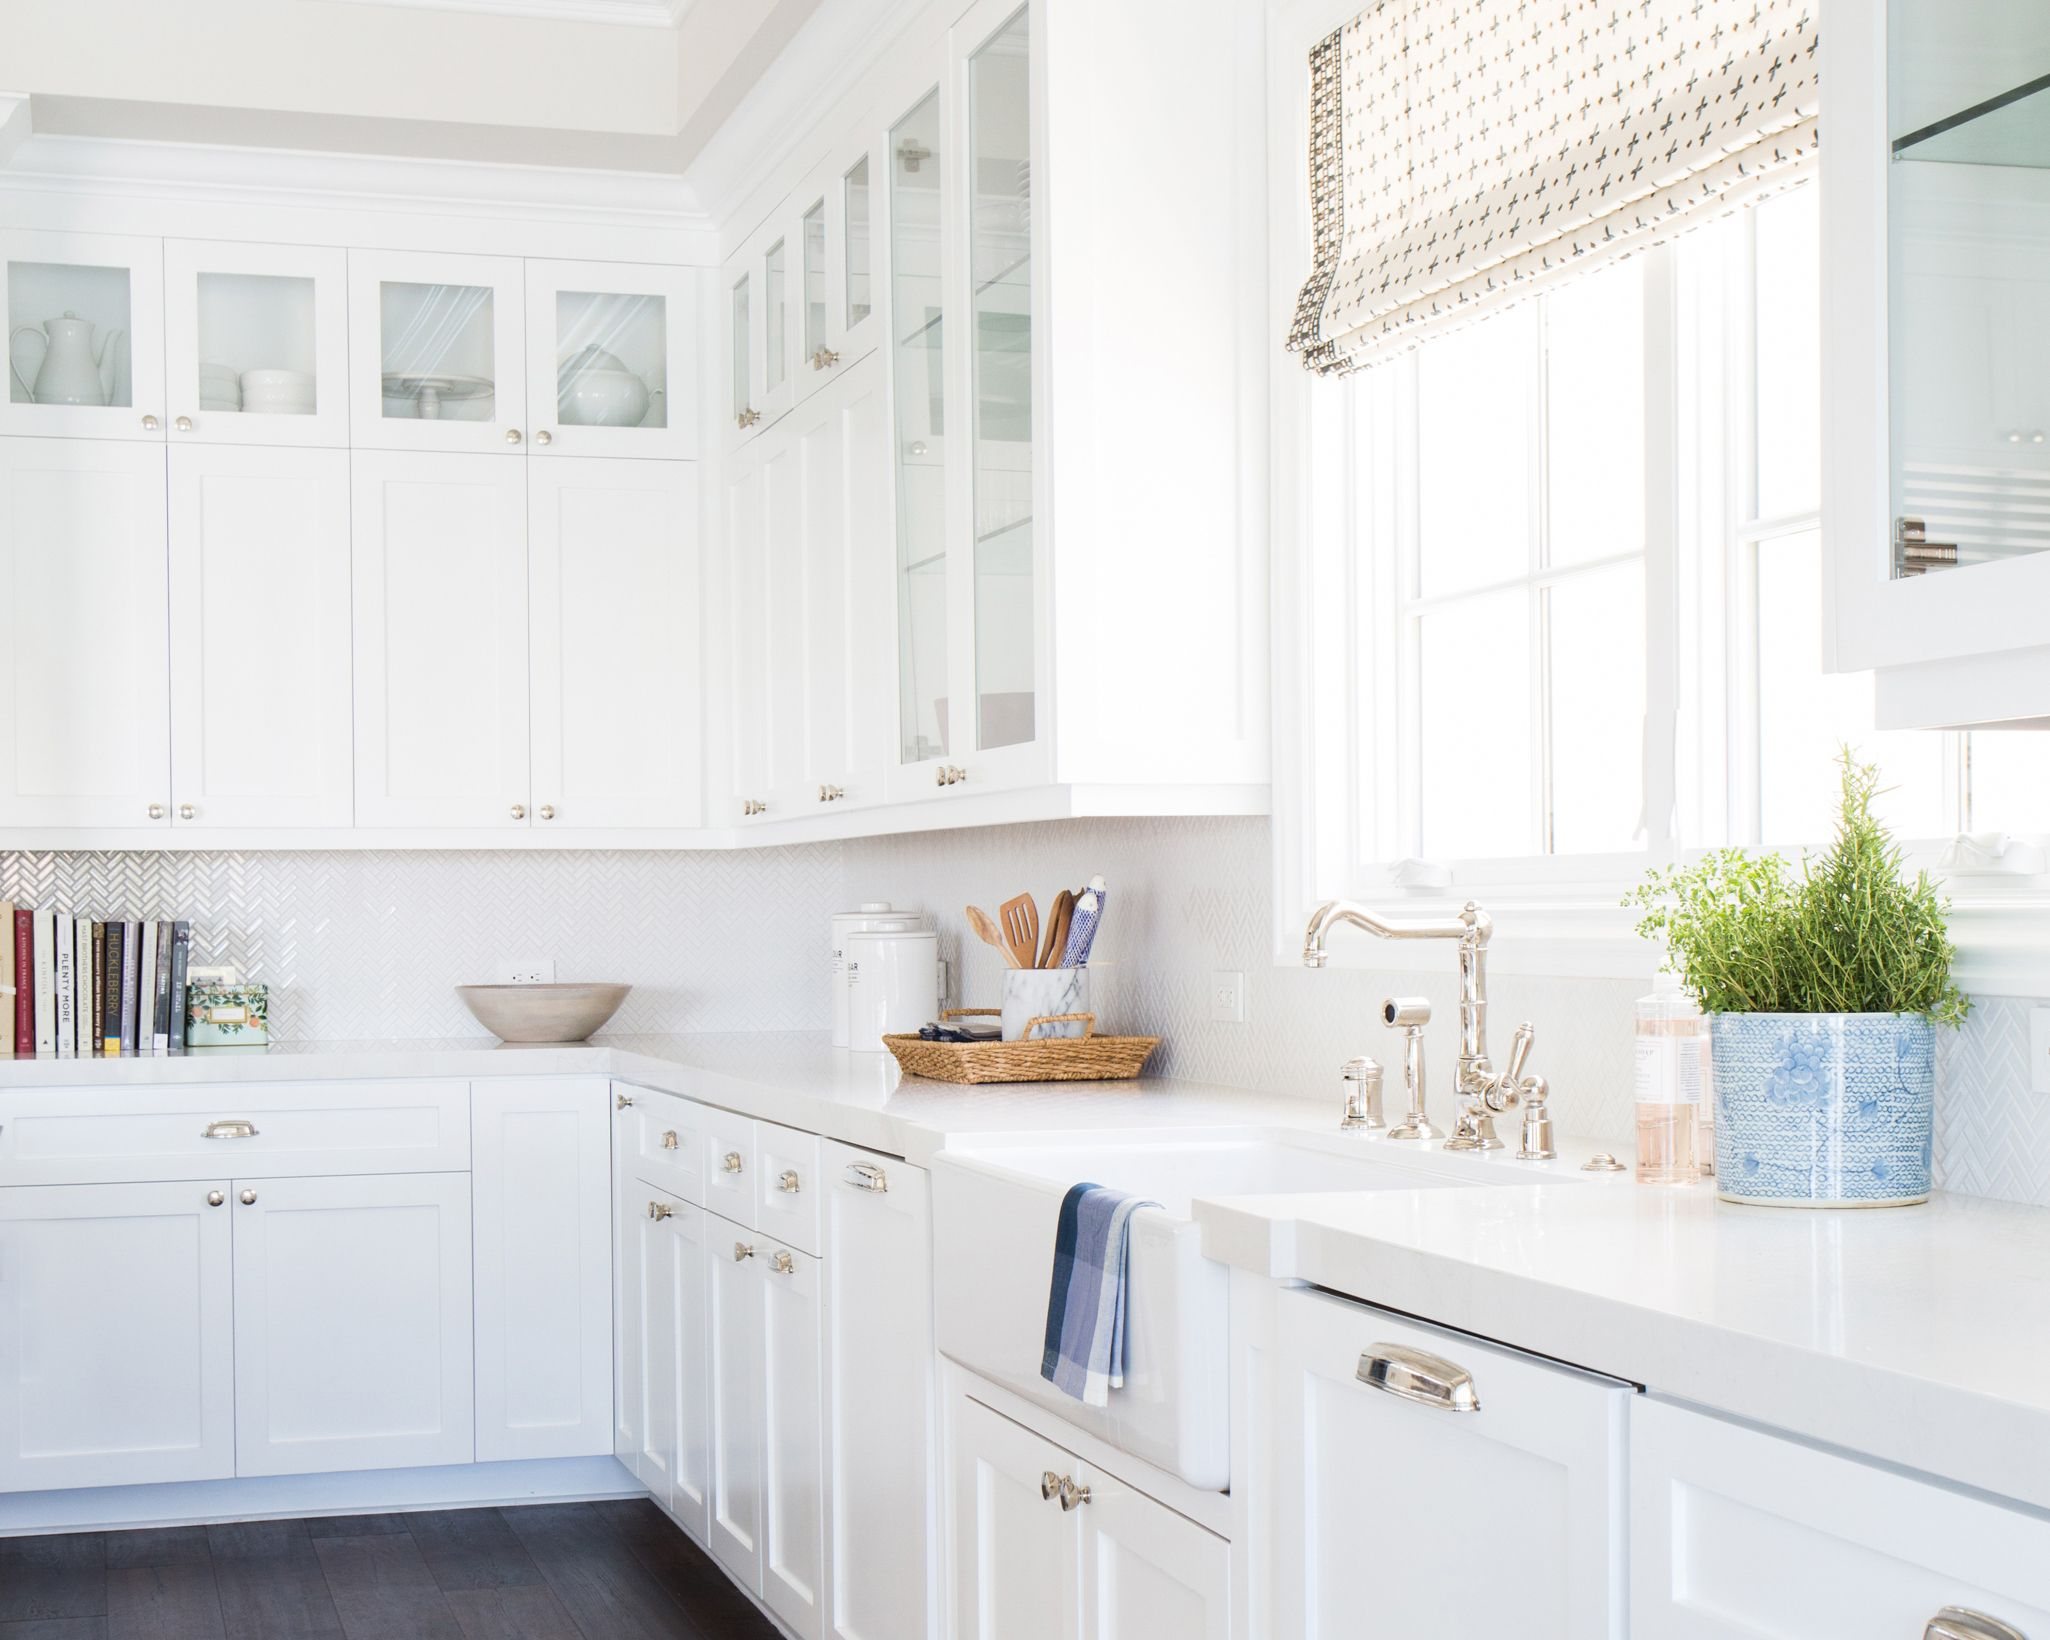 Pacific Palisades STUDIO MCGEE White kitchen design